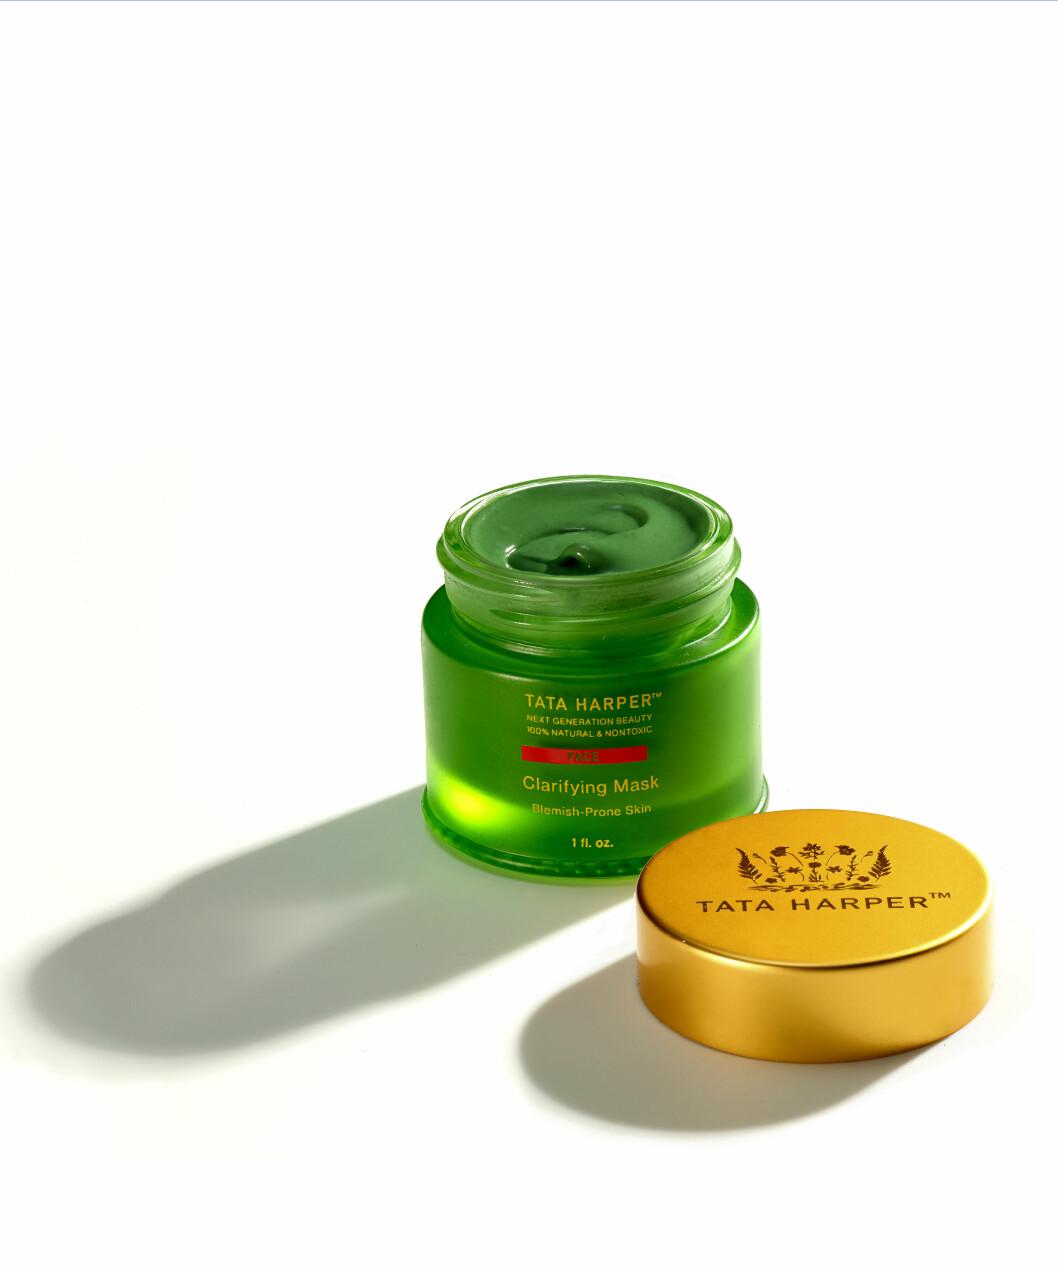 Peelende maske (kr 730, Tata Harper, Clarifying Mask)